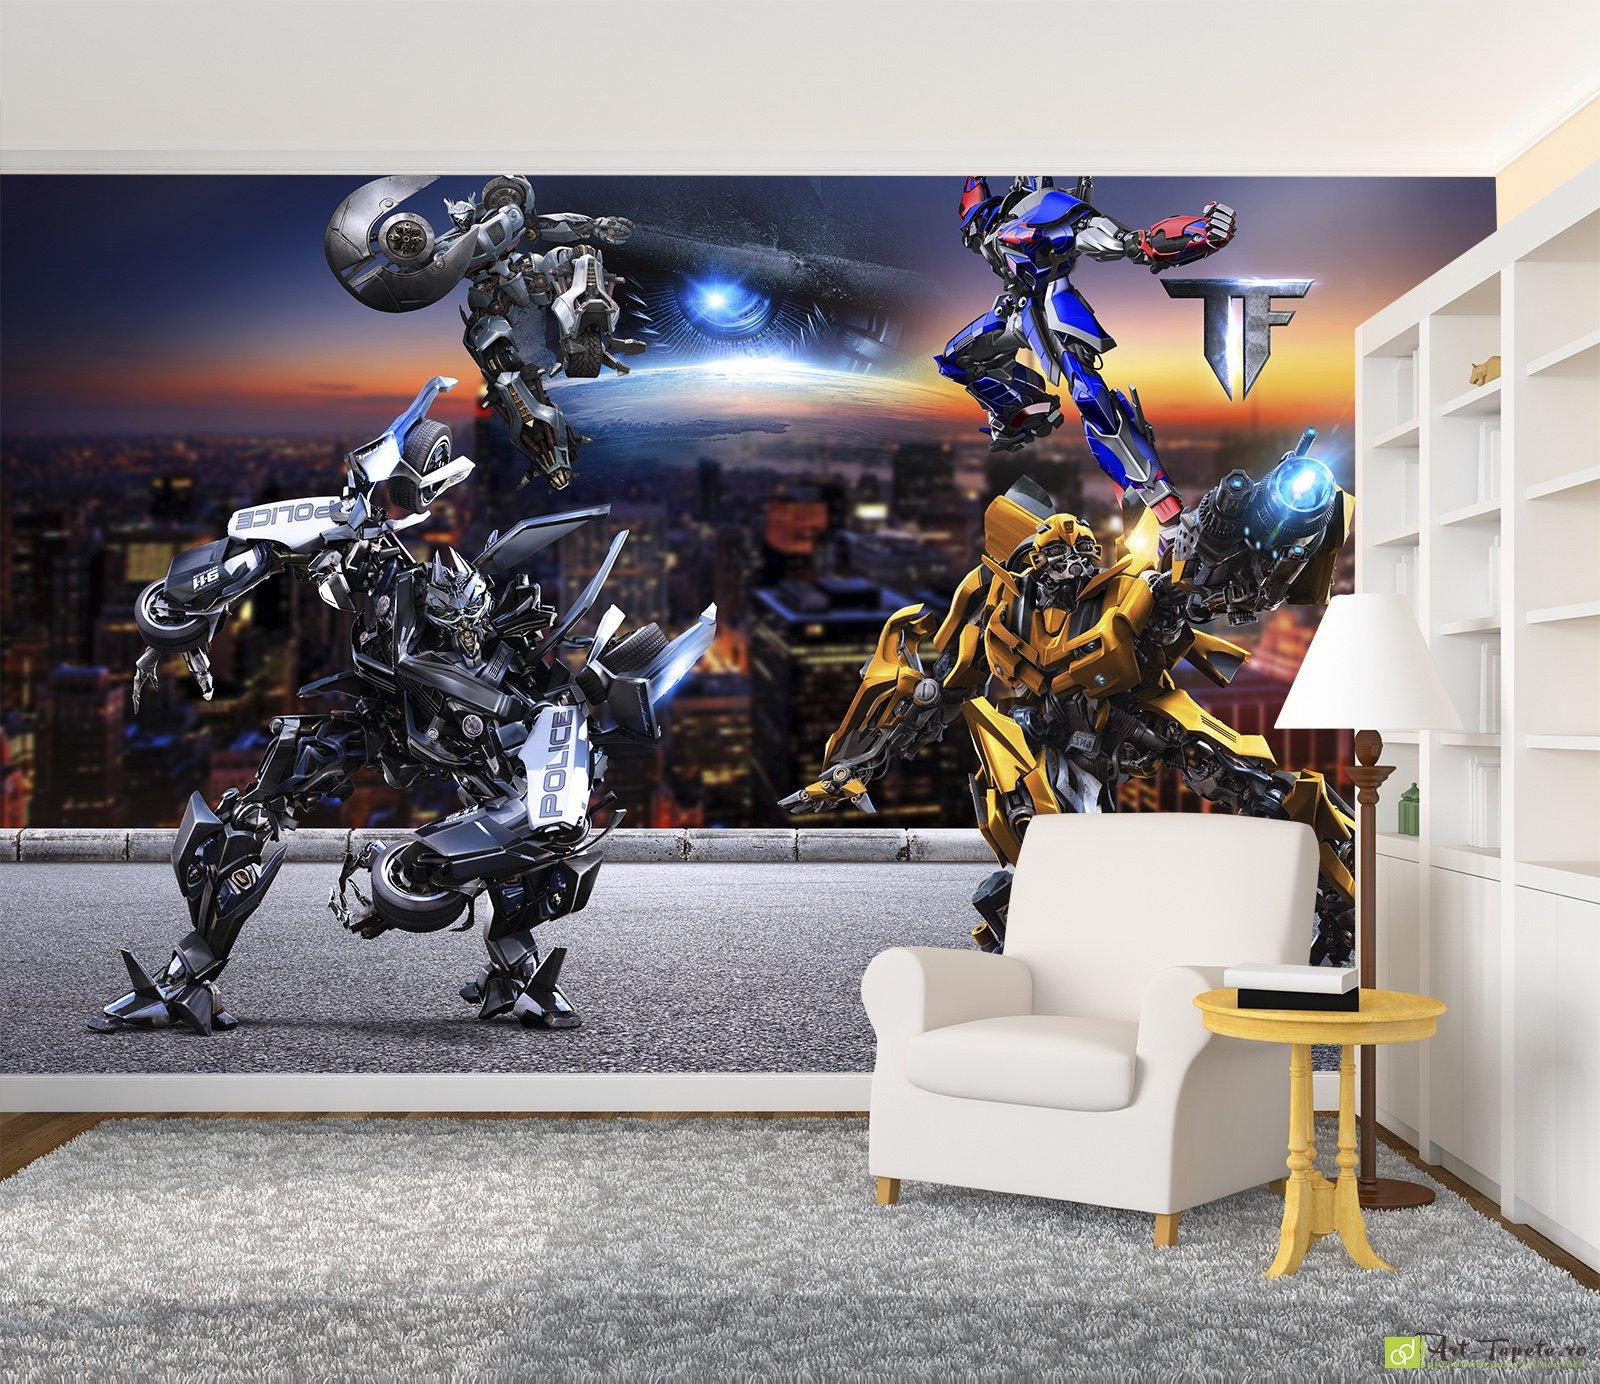 Tapet pentru copii transformers desene animate foto tapet la comand cluj napoca fototapet - Transformers tapete ...